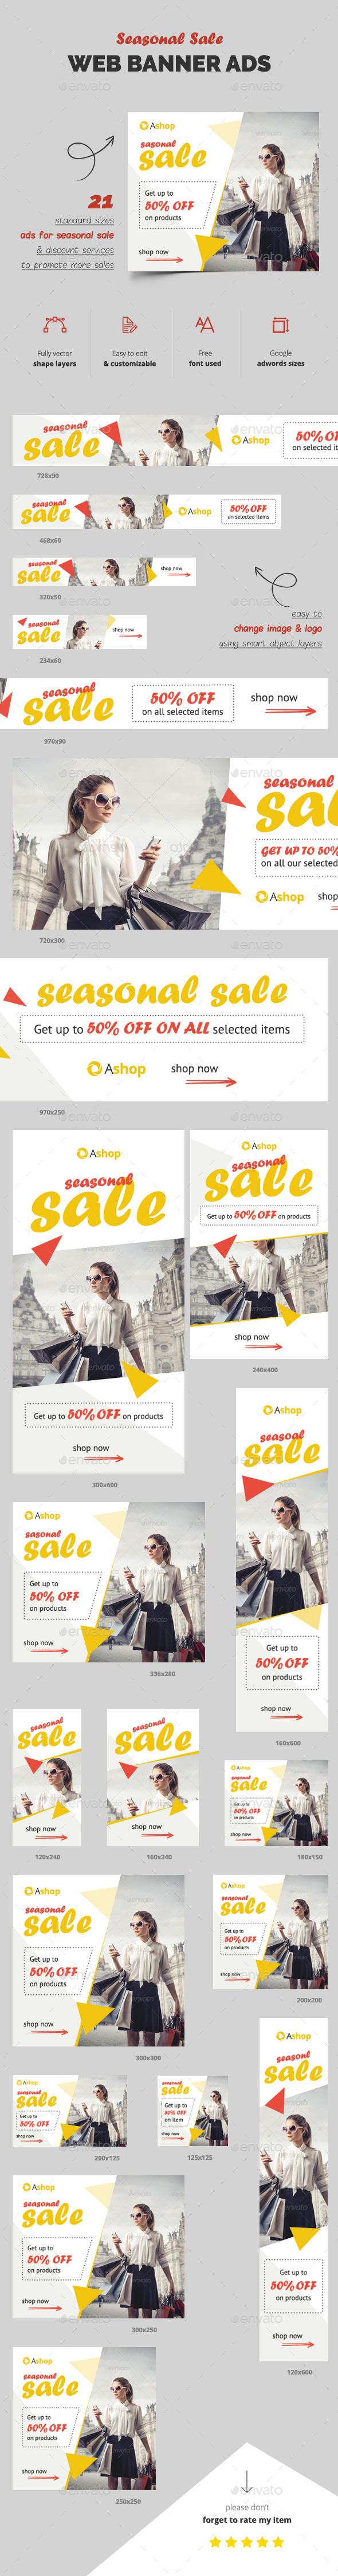 Seasonal Sale Banner Ads - Banners & Ads Web Elements